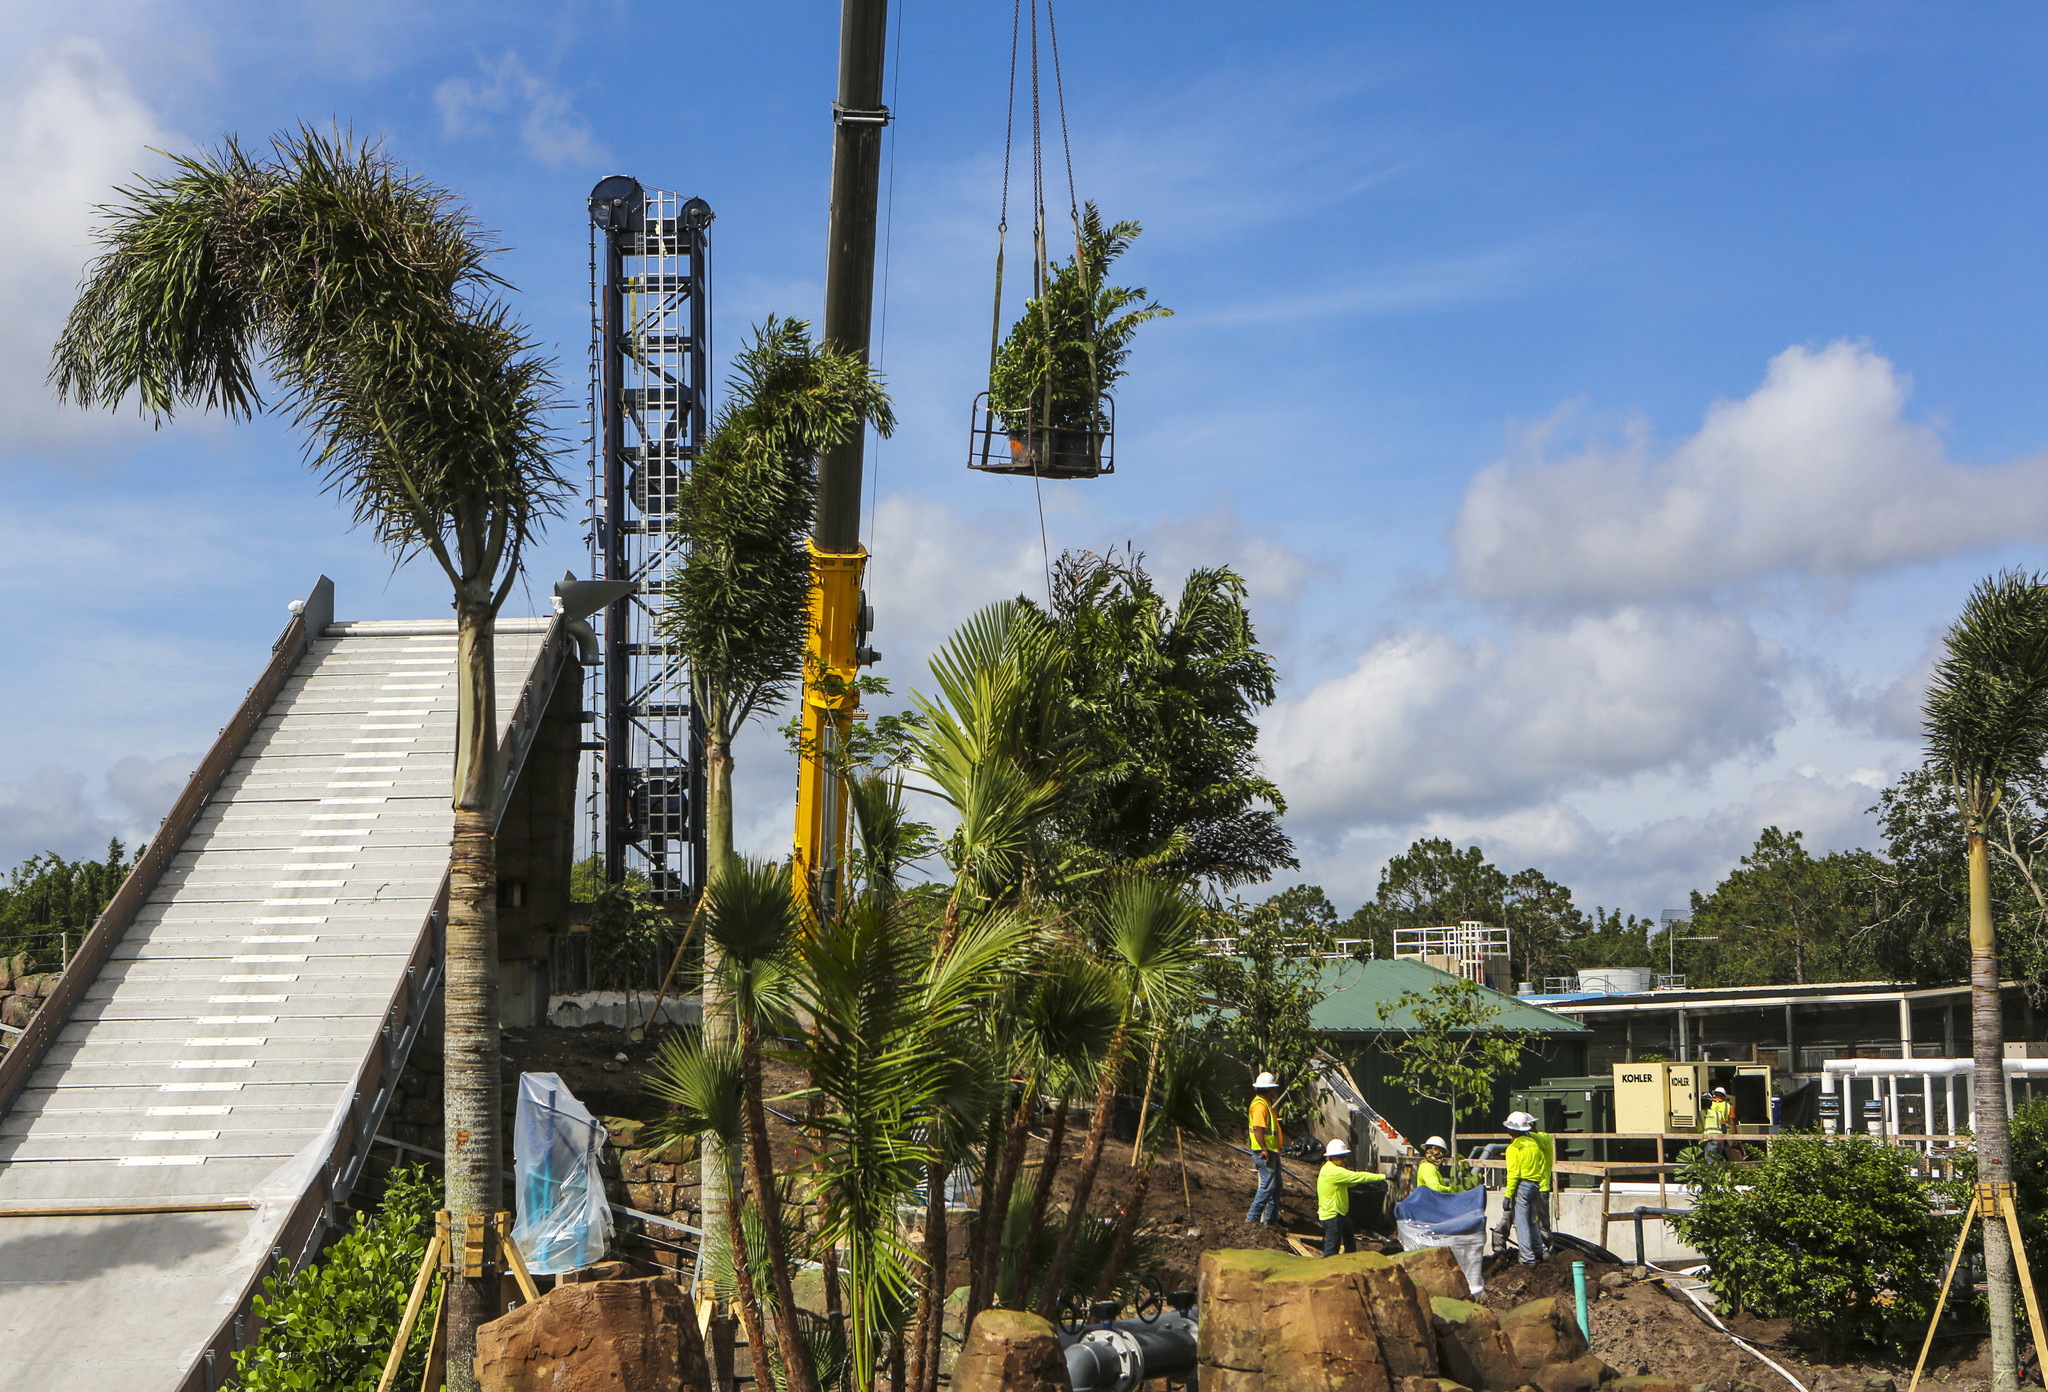 Local construction crane supplier buys Orlando warehouse property to ...